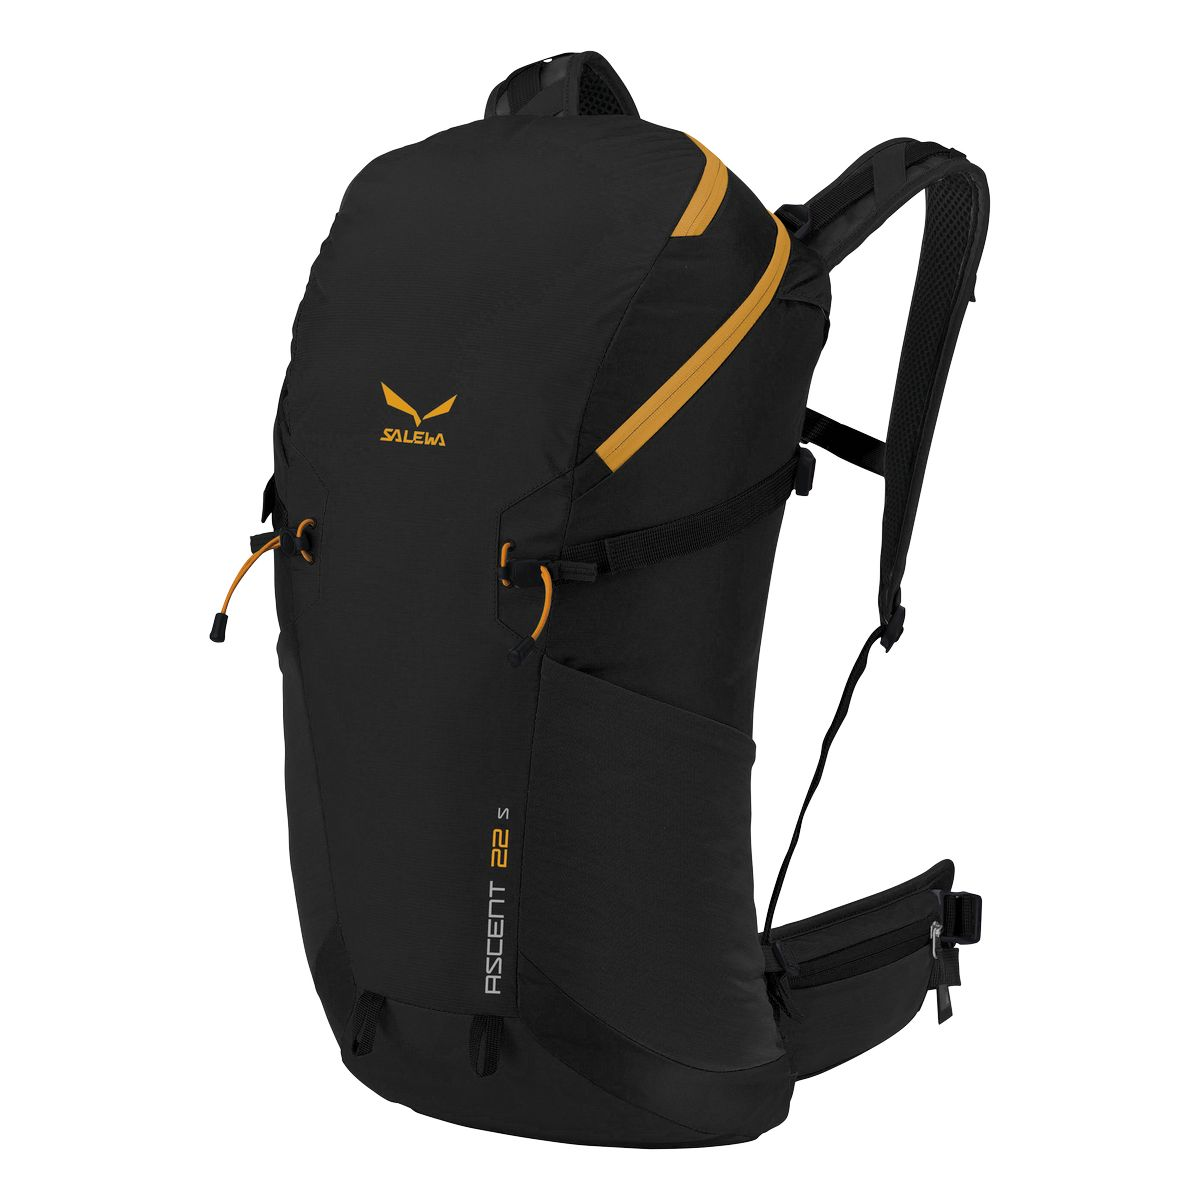 Купить Рюкзак туристический Salewa 2016 Ascent 22s Black Рюкзаки туристические 1240997